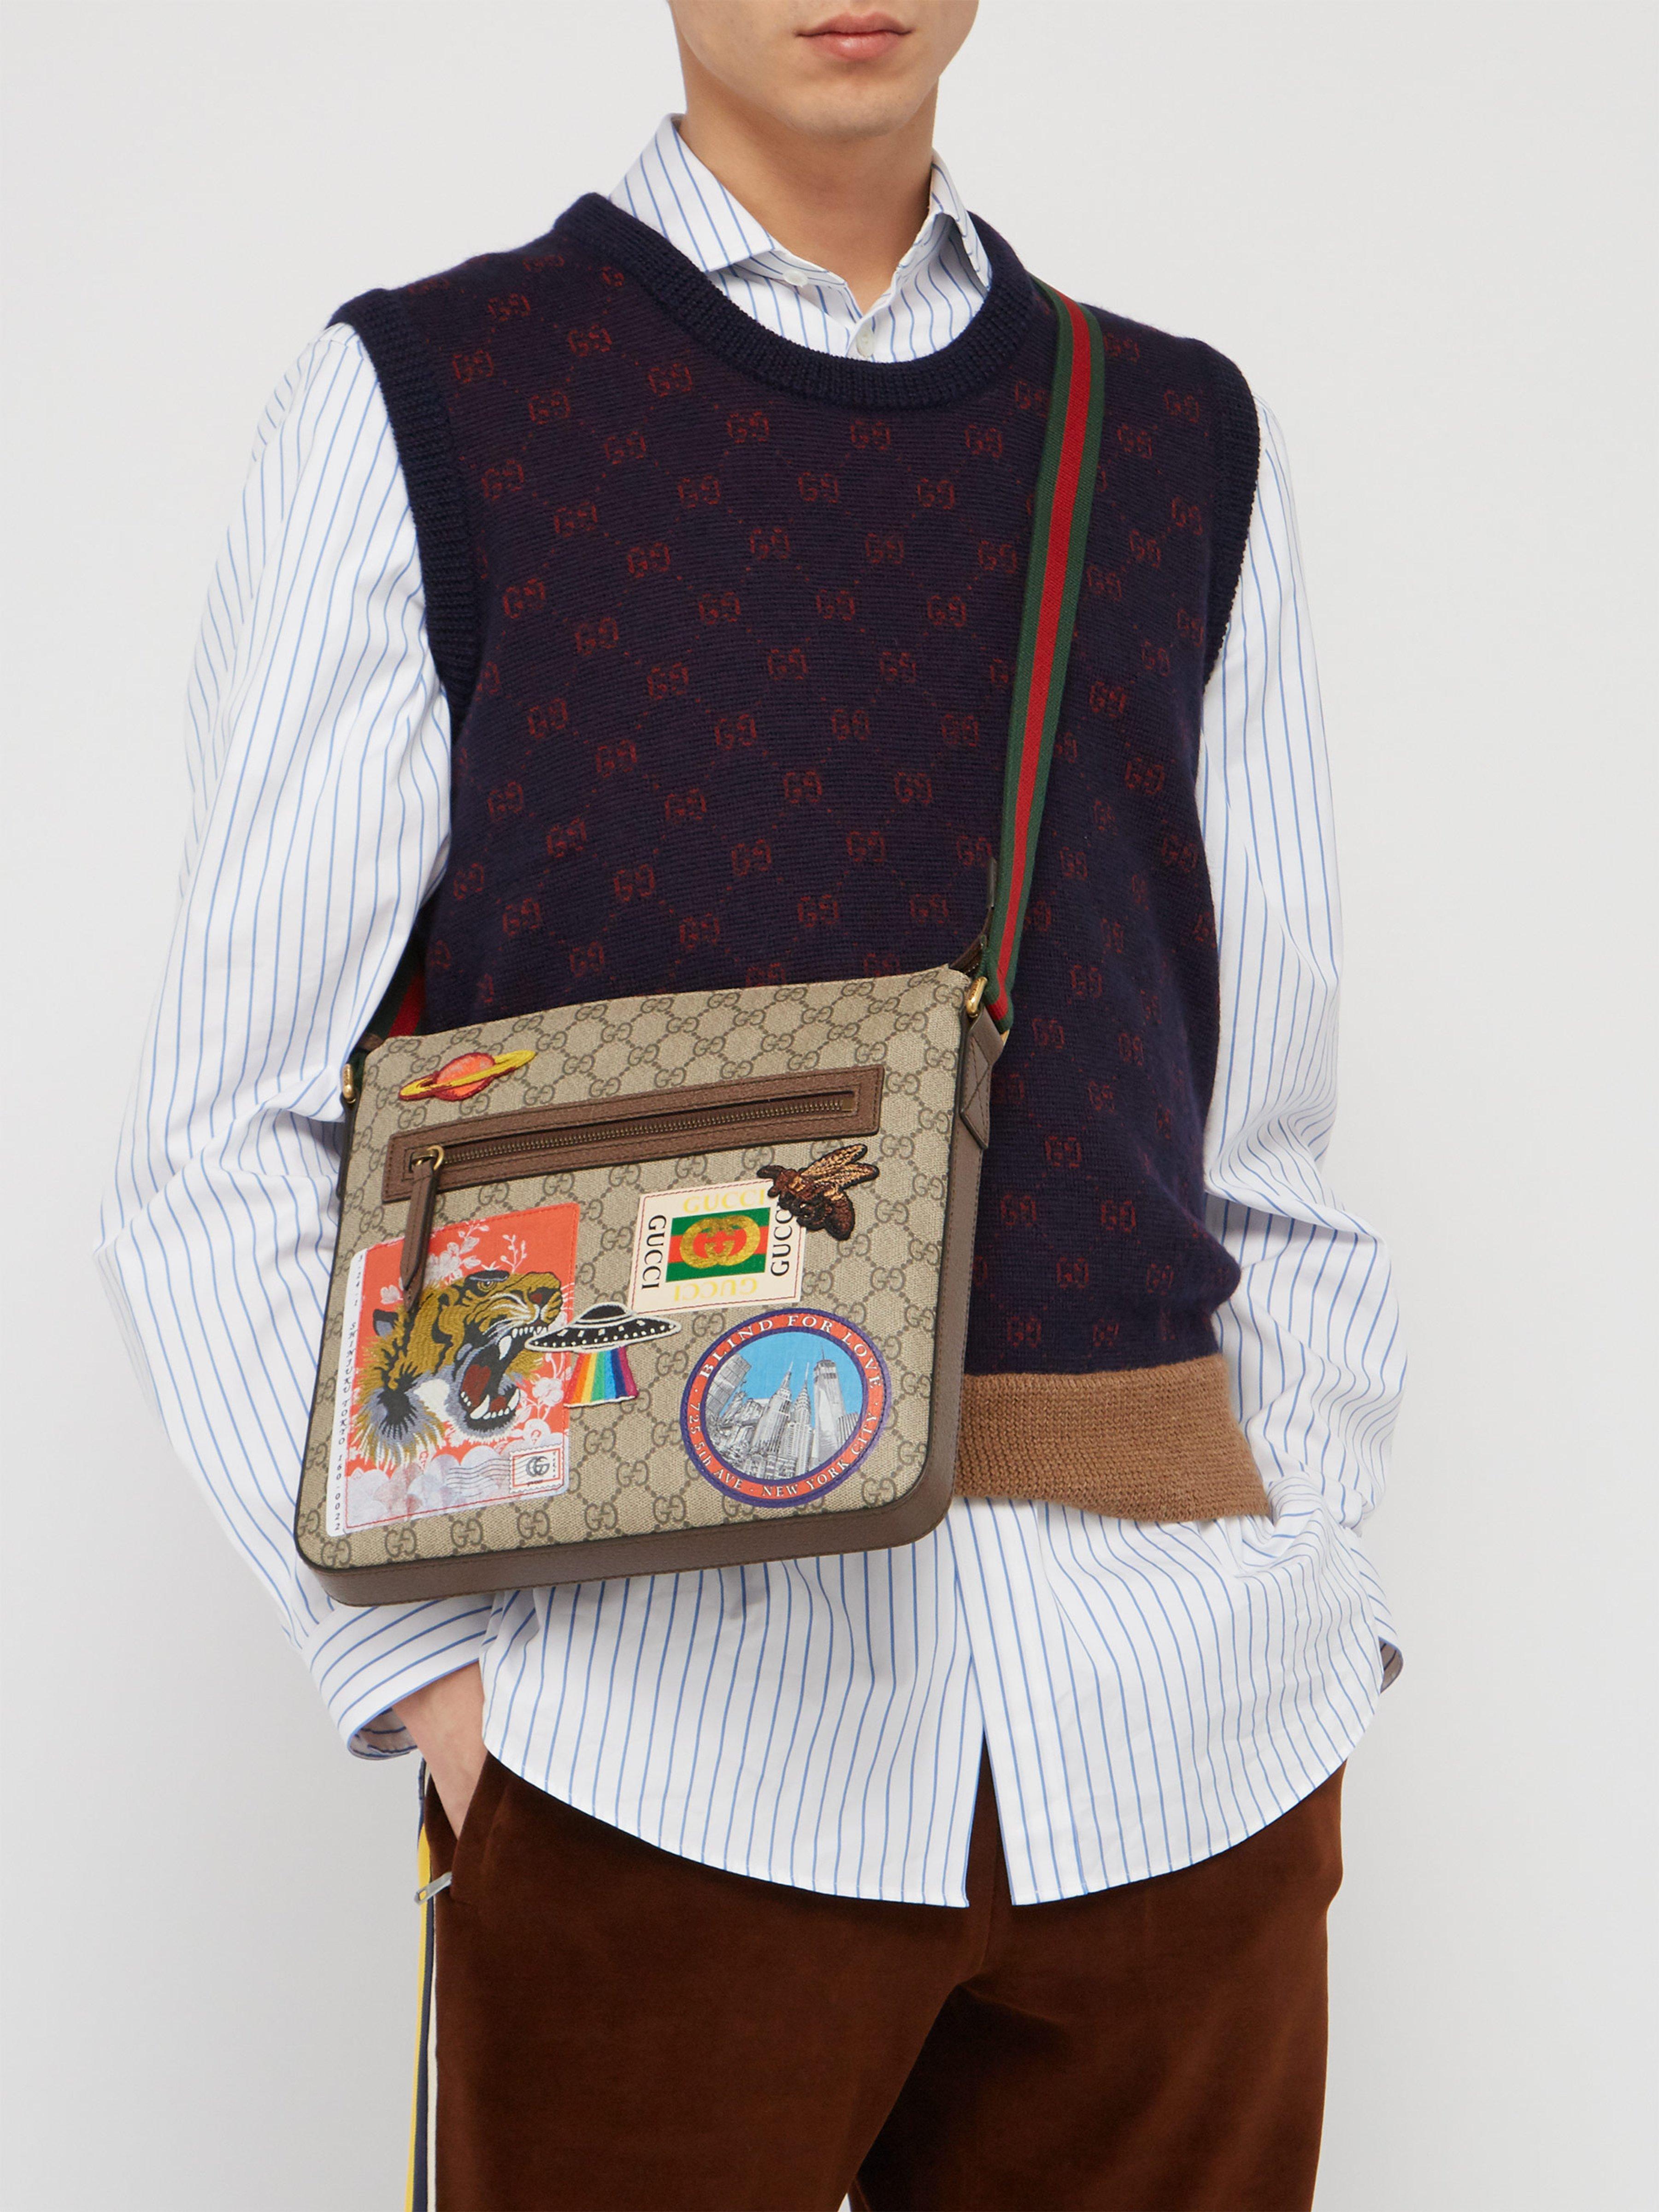 09bd174ba192 Gucci Gg Supreme Ufo Logo Patch Messenger Bag in Brown for Men - Lyst